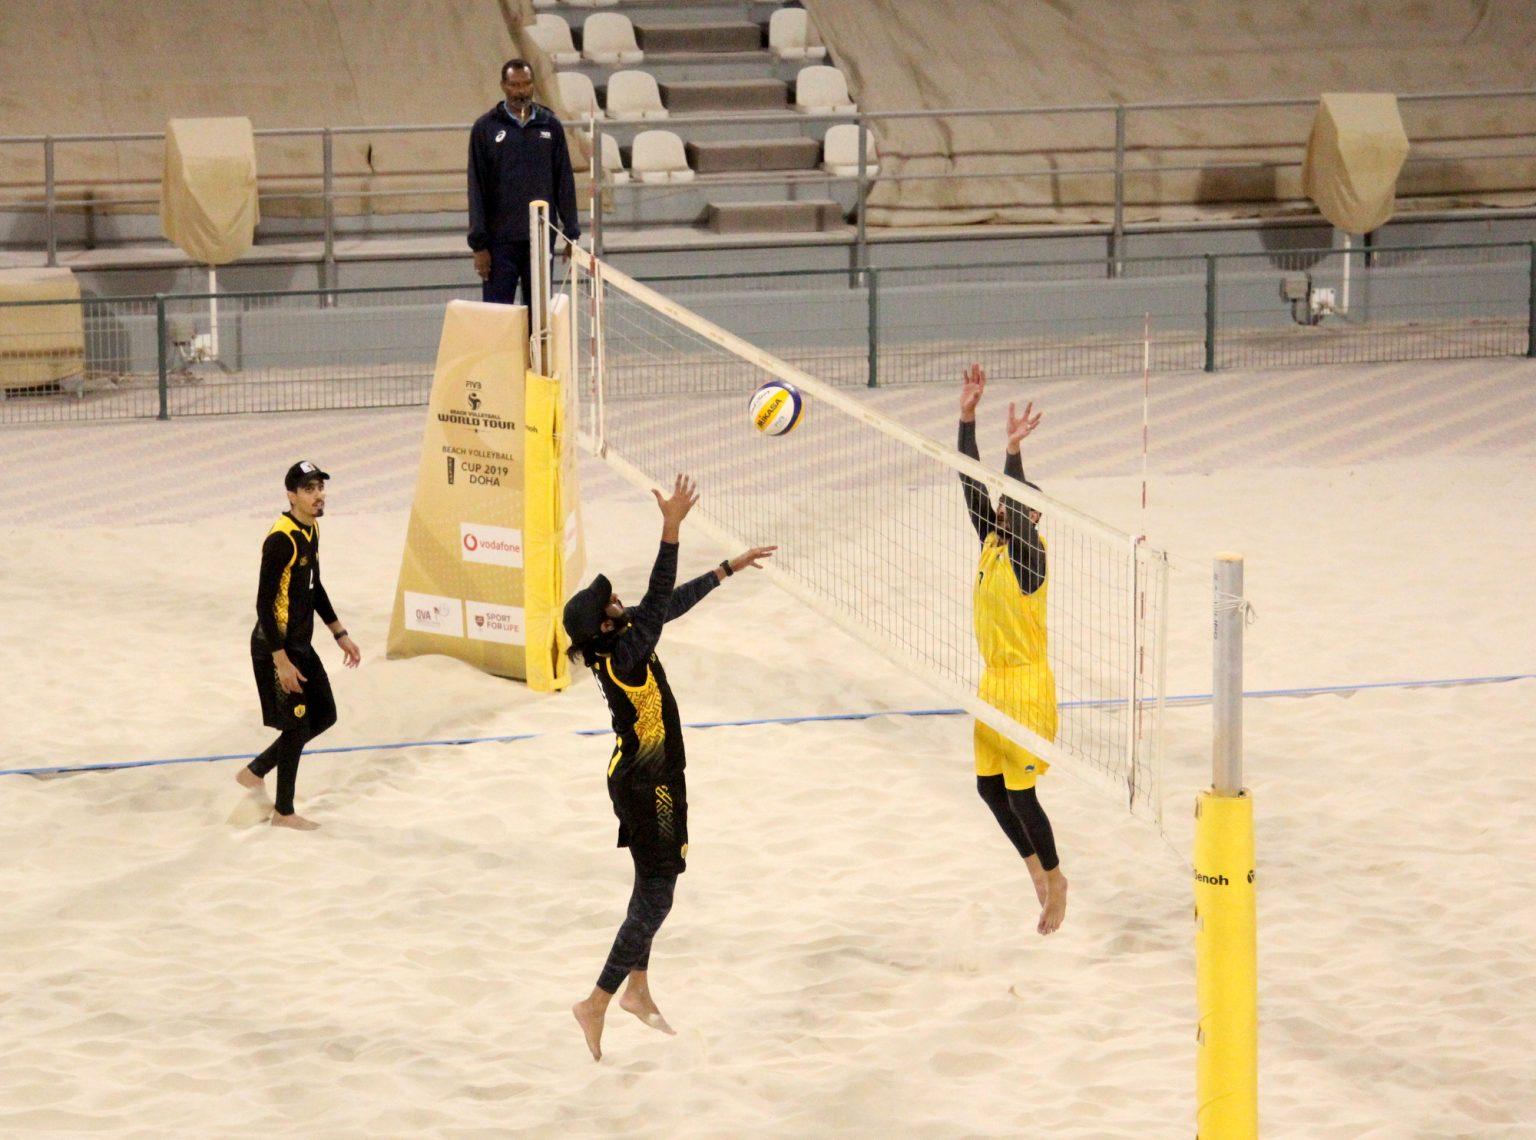 QATAR GETS INAUGURAL MEN'S BEACH VOLLEYBALL LEAGUE OFF THE GROUND